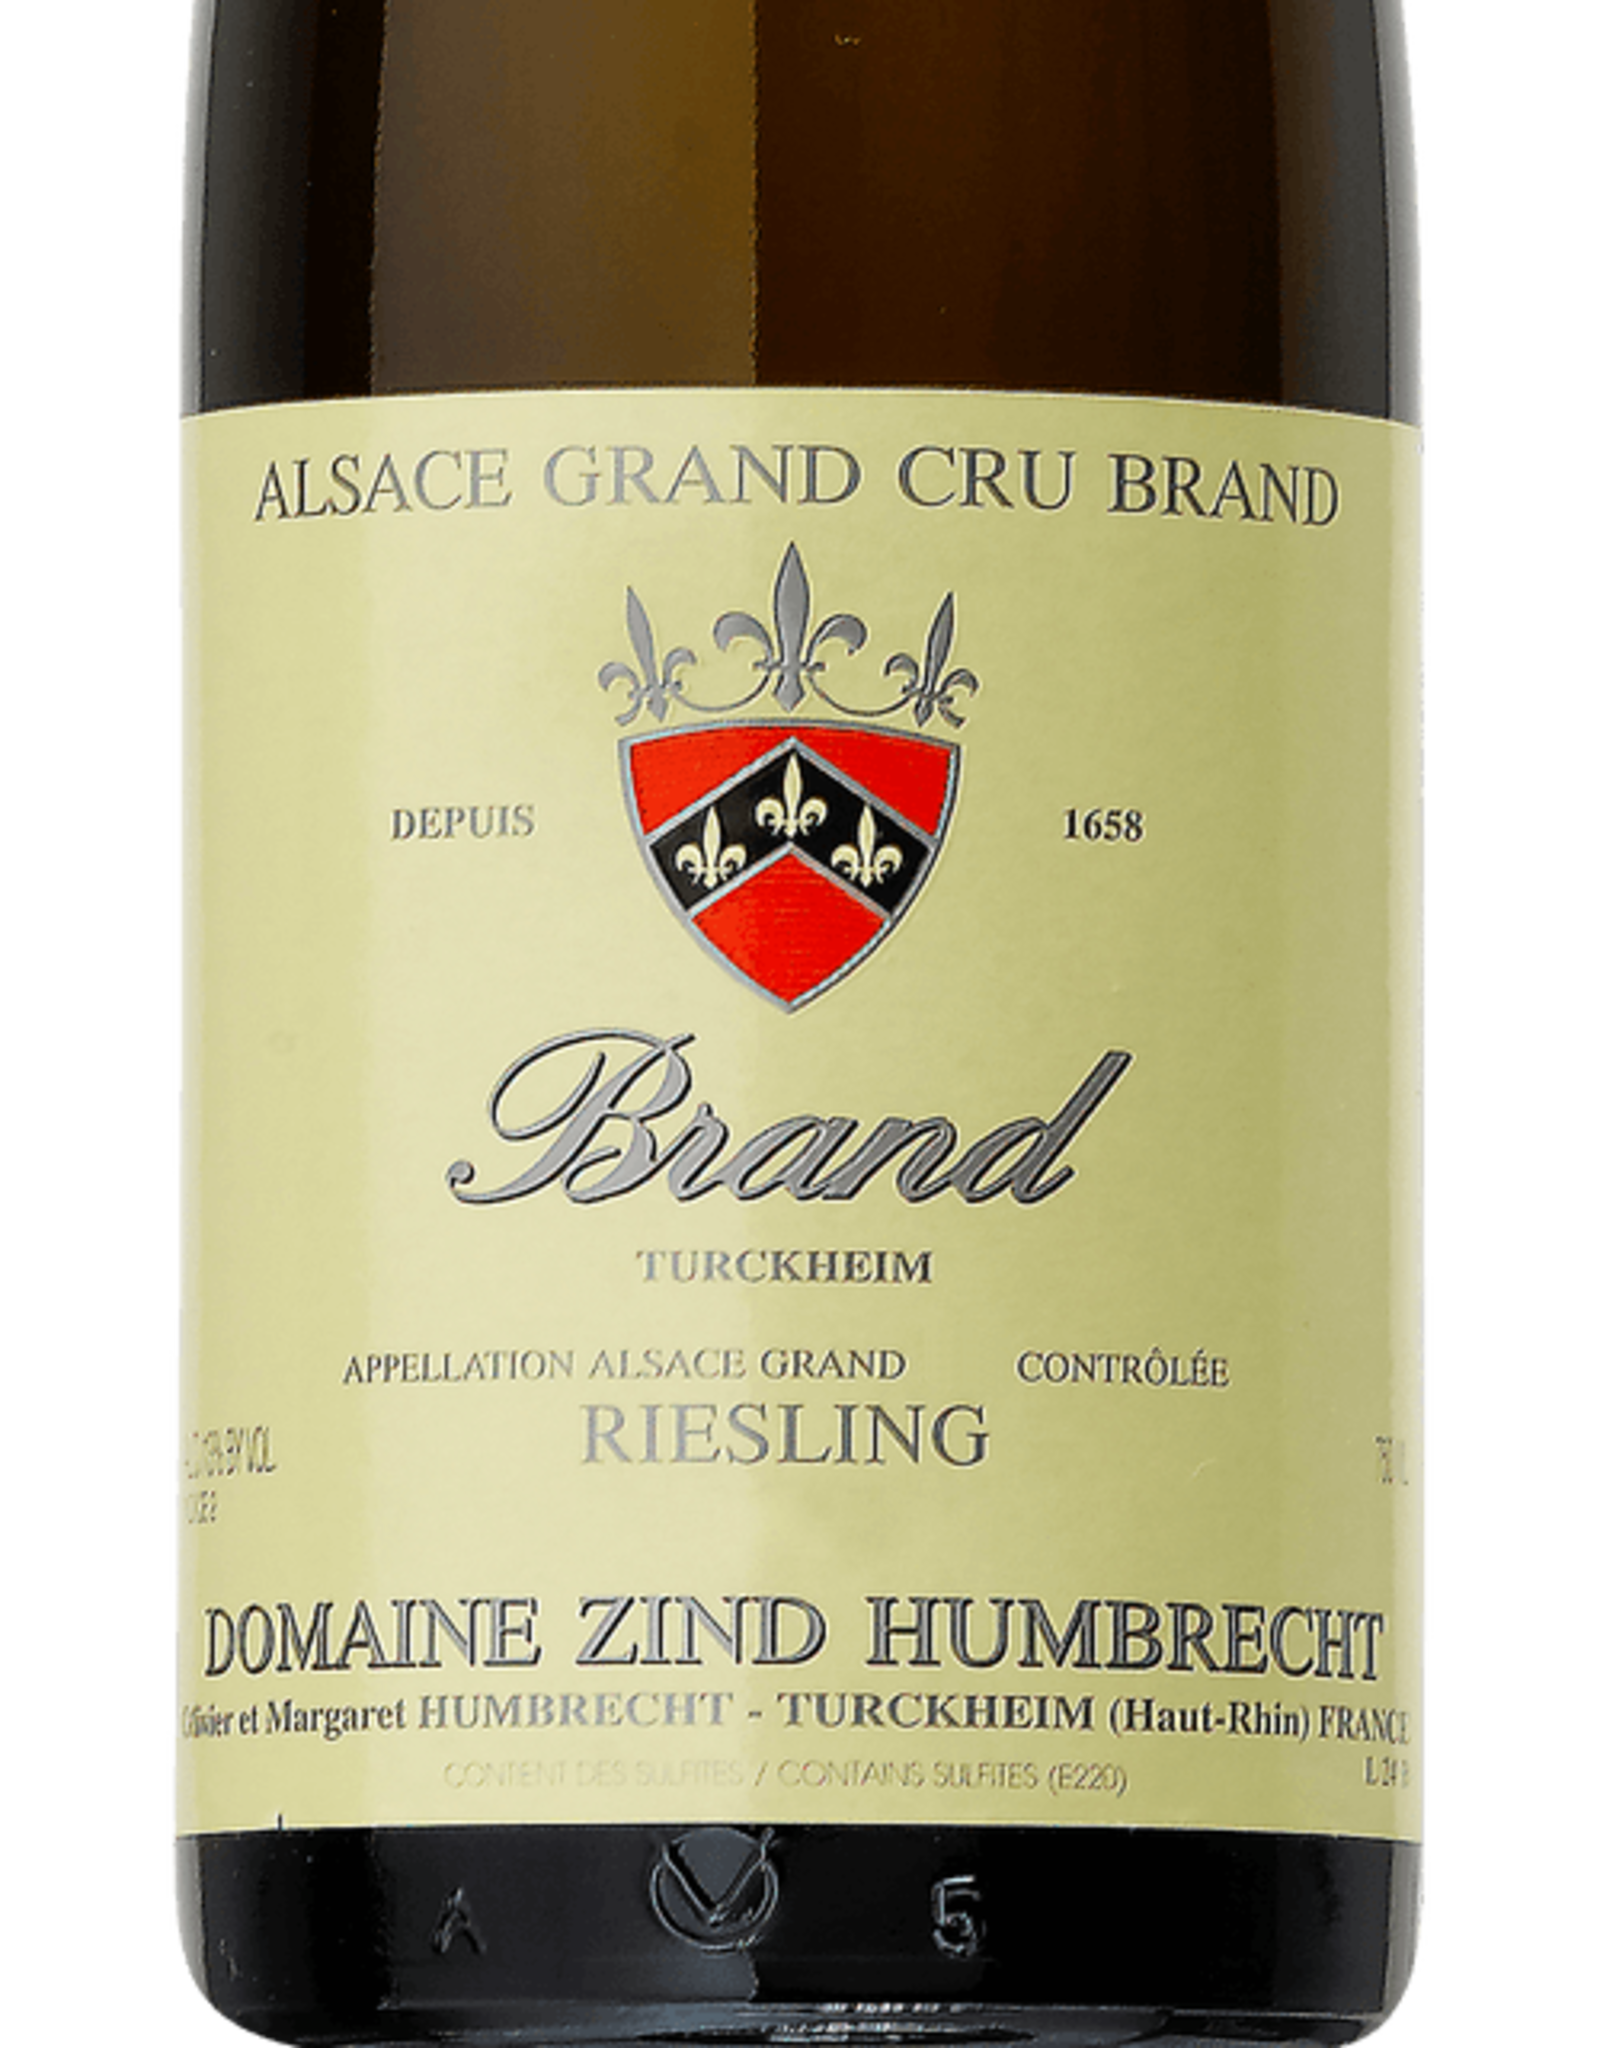 Domaine Zind-Humbrecht Brand Riesling 2017